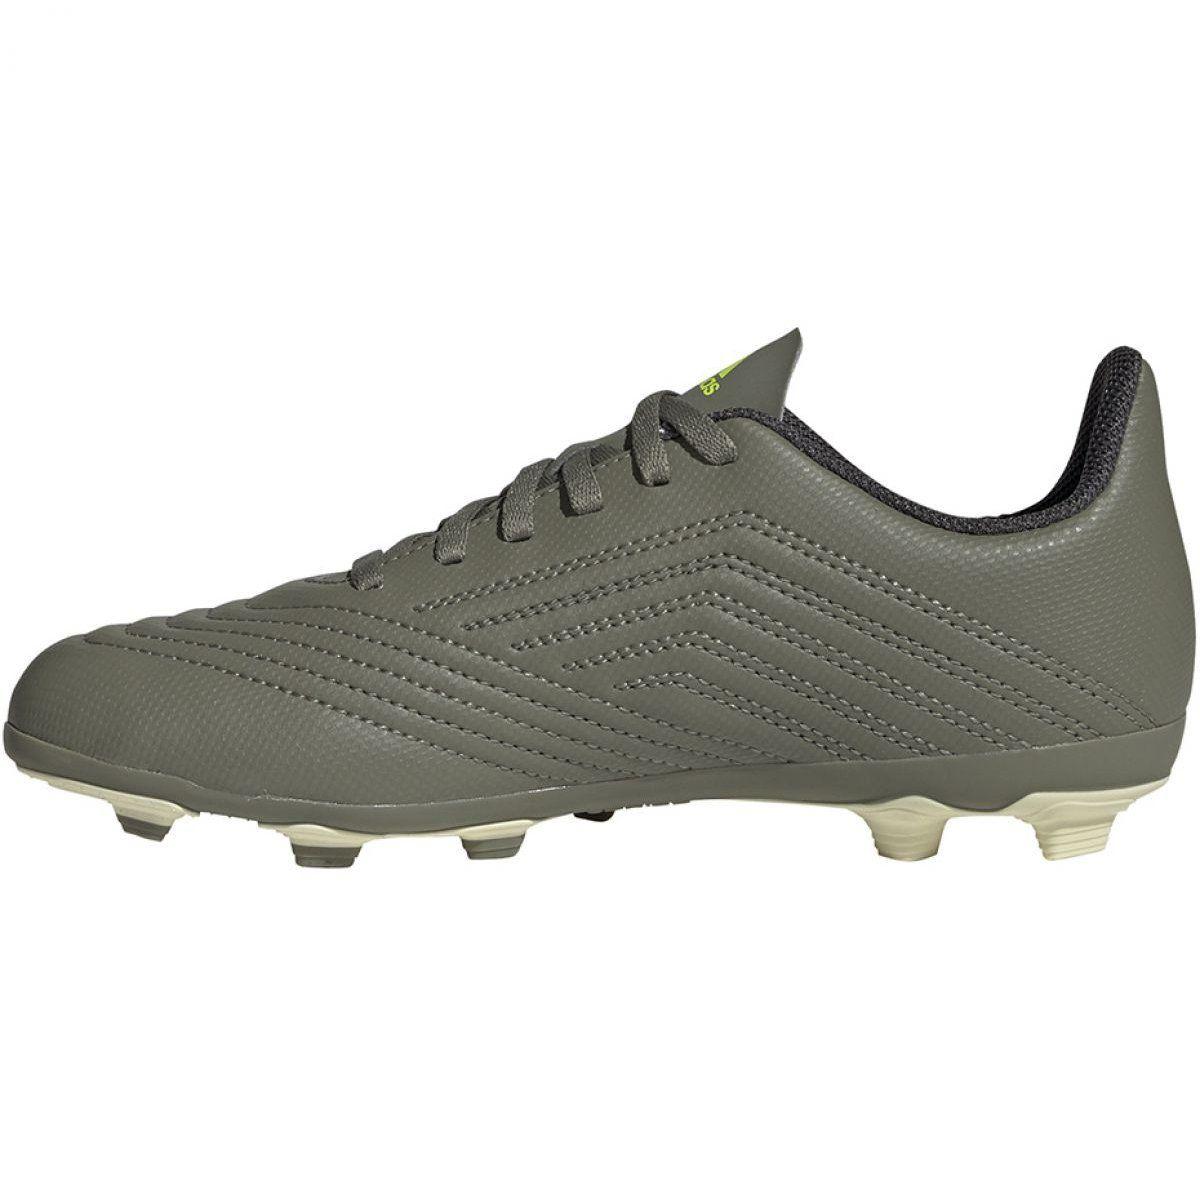 Buty Pilkarskie Adidas Predator 19 4 Fxg Jr Ef8221 Wielokolorowe Szare Football Shoes Adidas Predator Sports Footwear